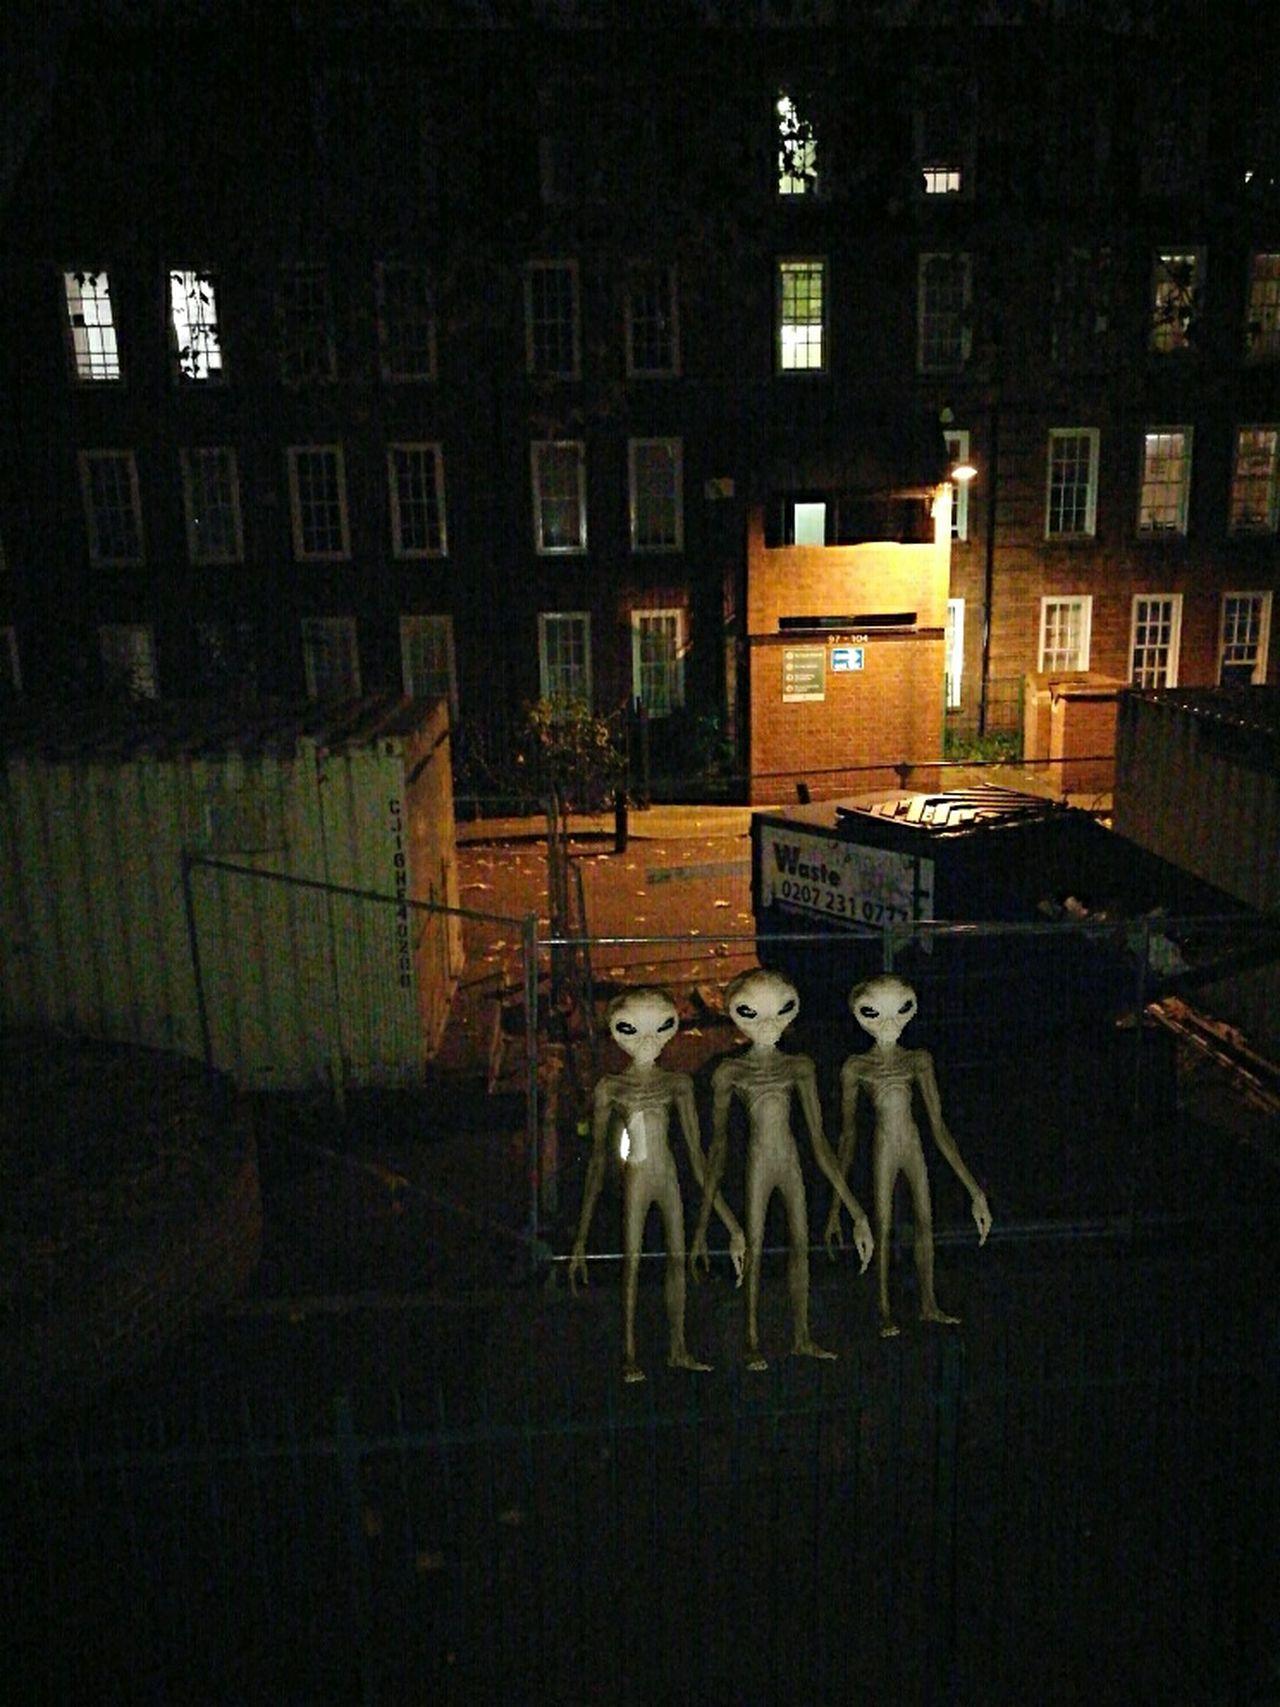 Alien Alien Invasion Fantasy Dreaming At Home LONDON❤ Enjoying Life UFO Tranquility Life Cultures Night London London London!!! Fantasy SpaceShip Extraterrestrial